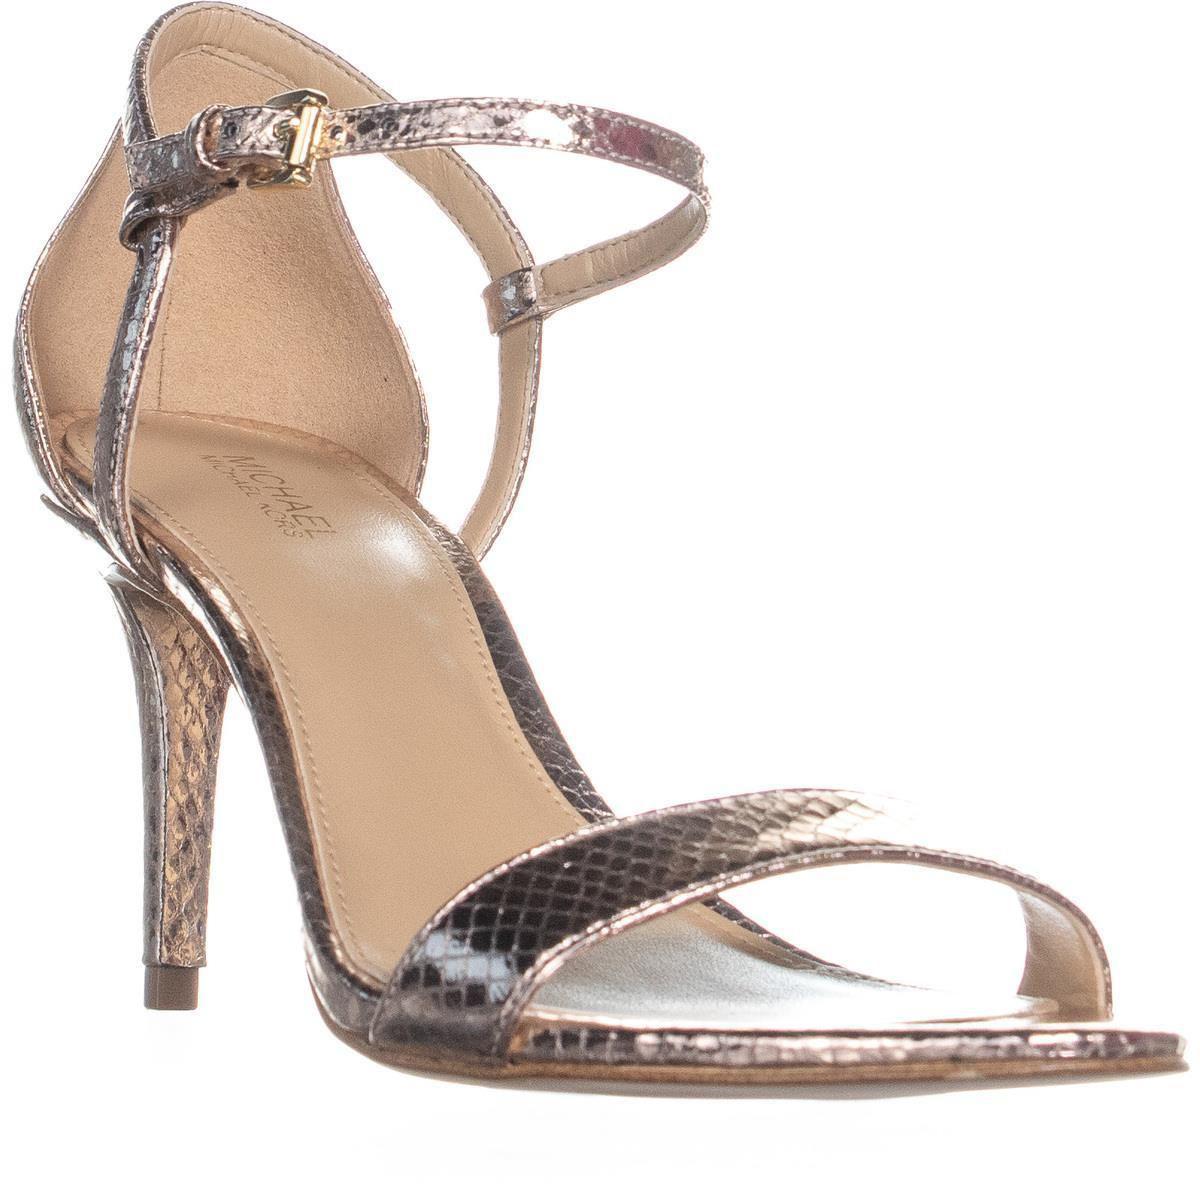 e3793cb0373 Michael Kors. Women s Michael Simone Mid Sandal Ankle Strap Sandals ...